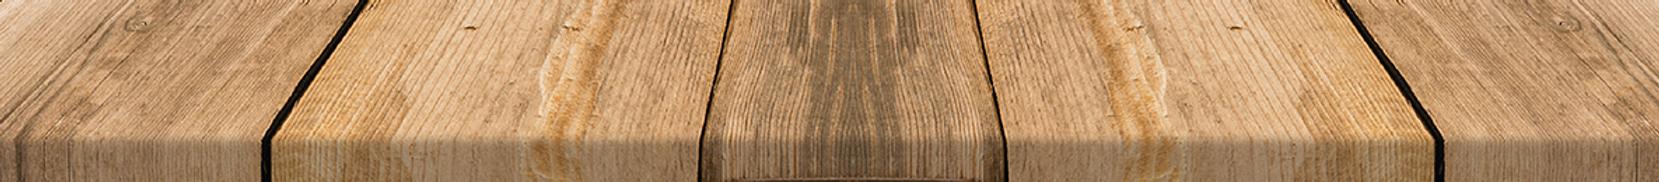 Bachhus-Holz.png